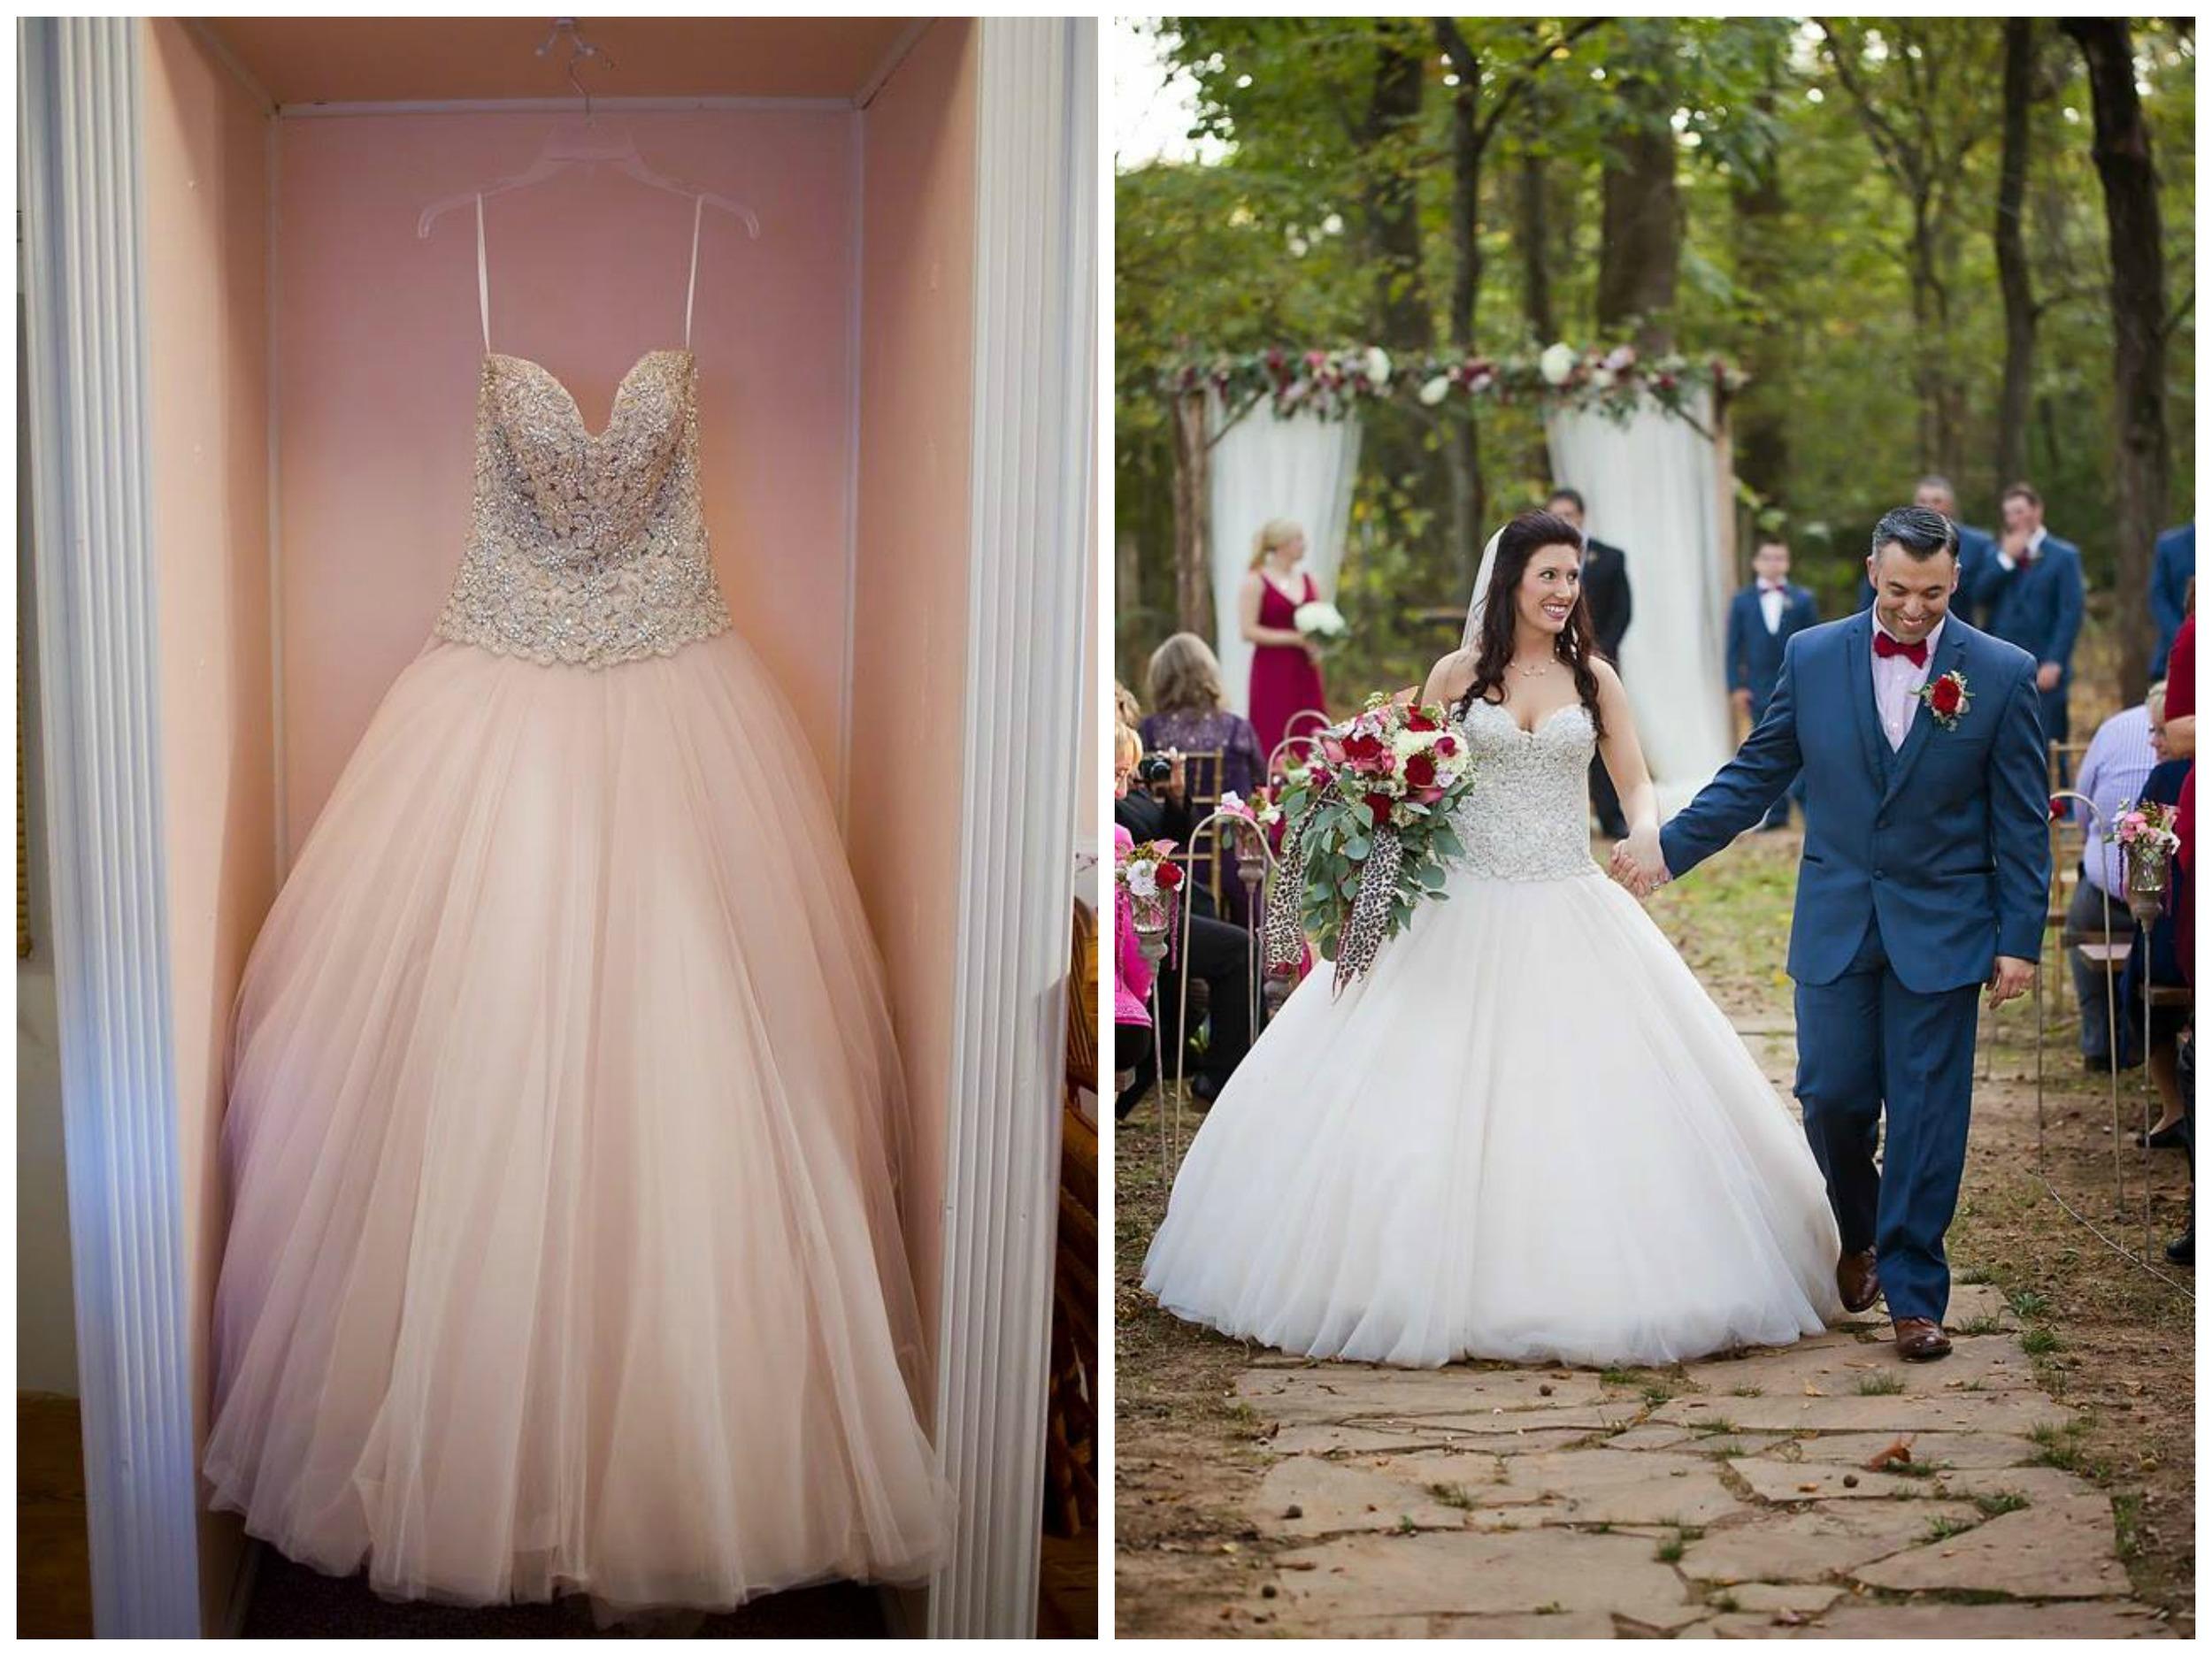 KMWarford Photography , from  Bethany + Jamie 's wedding at The Barn.